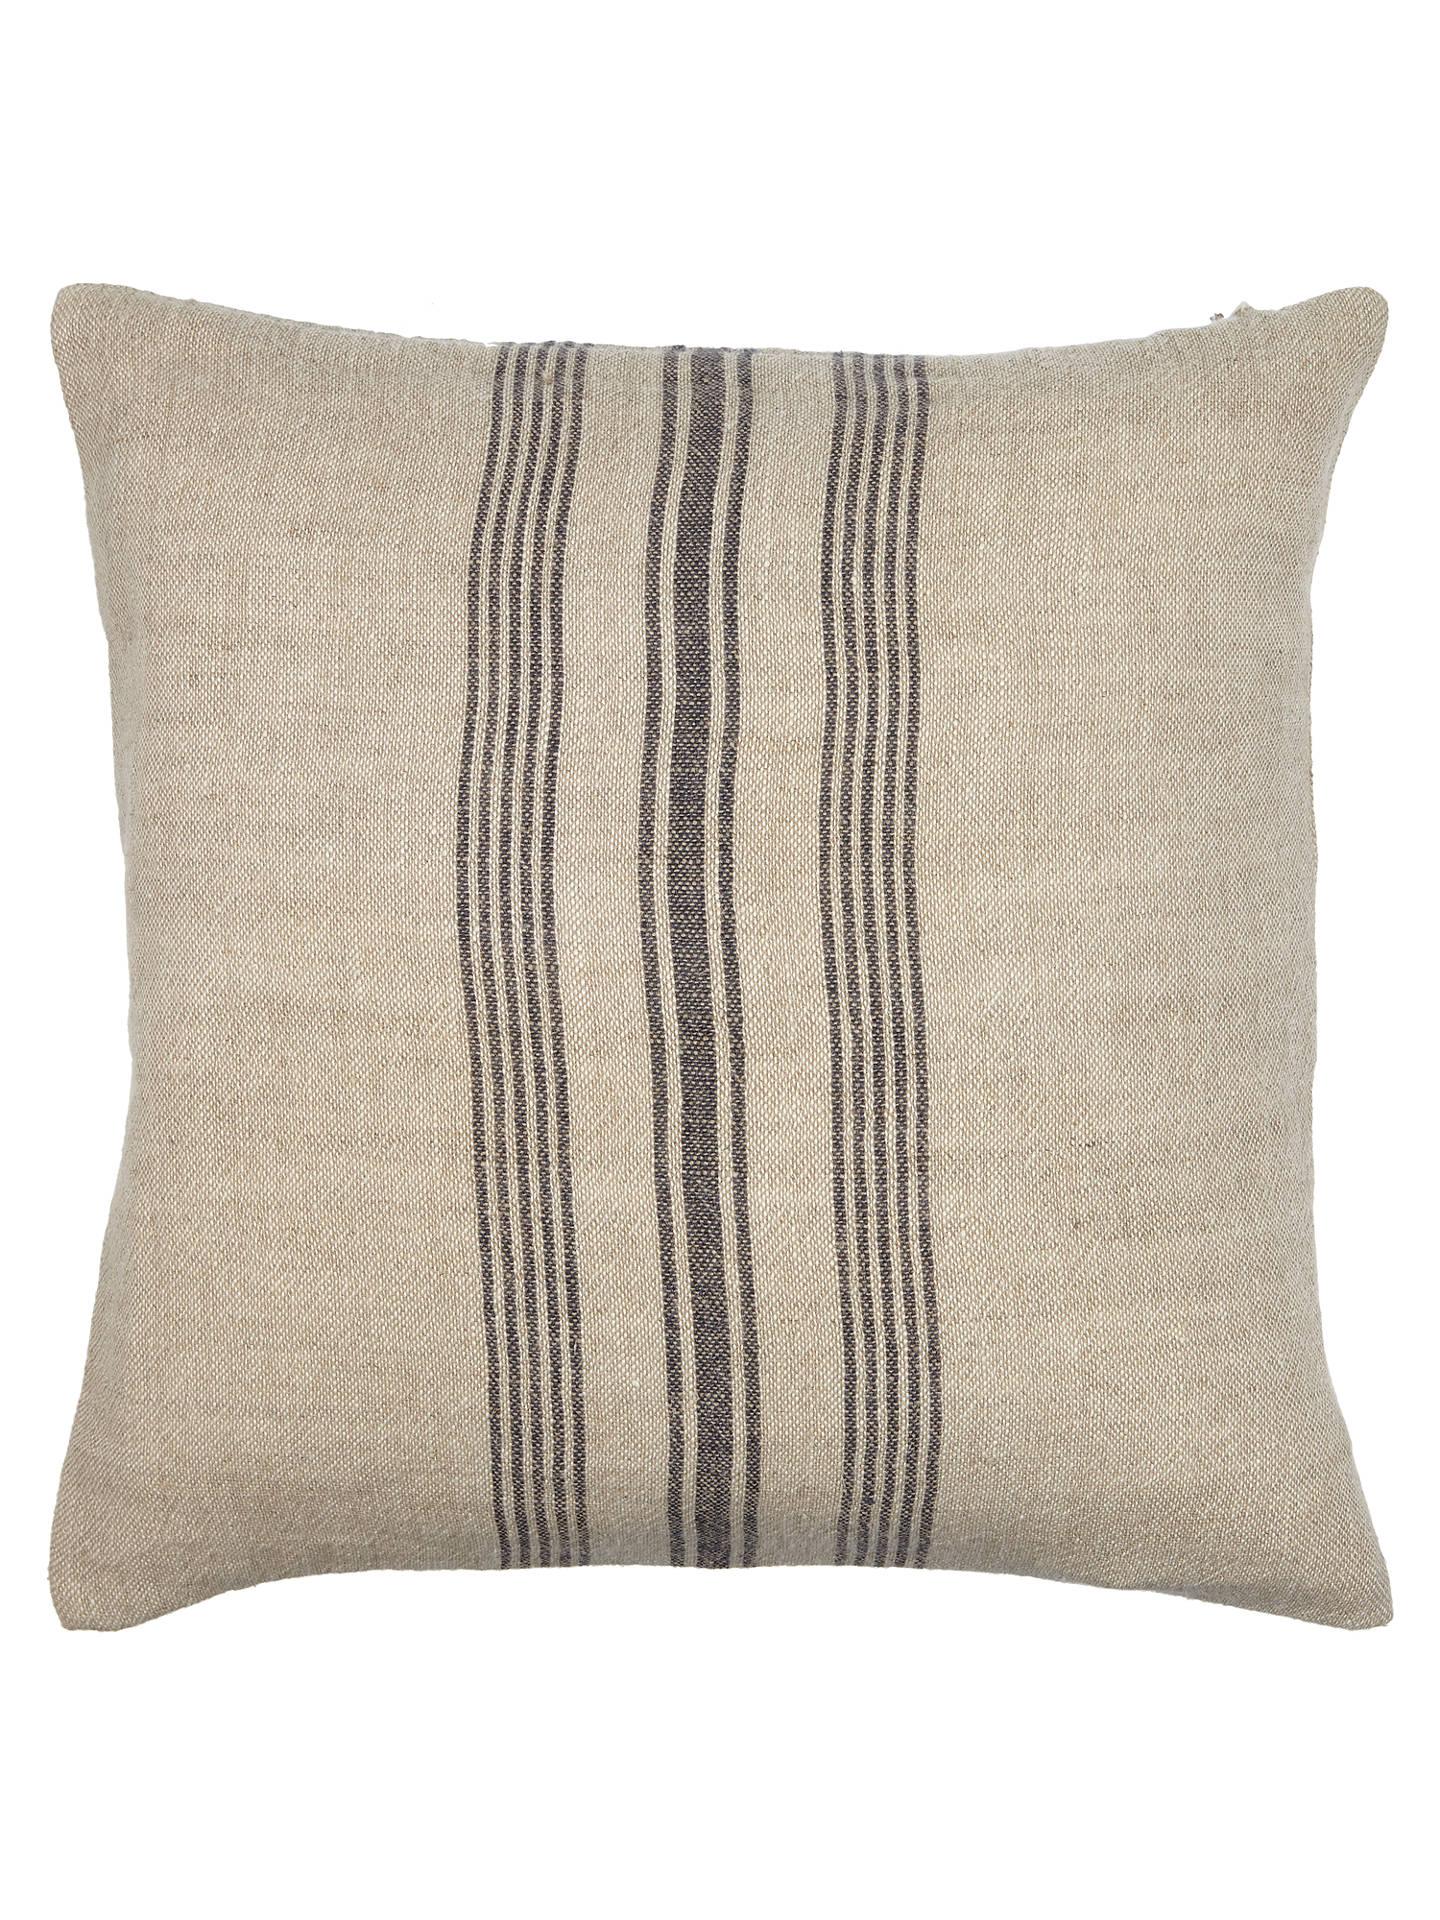 john lewis whitby stripe cushion at john lewis partners. Black Bedroom Furniture Sets. Home Design Ideas